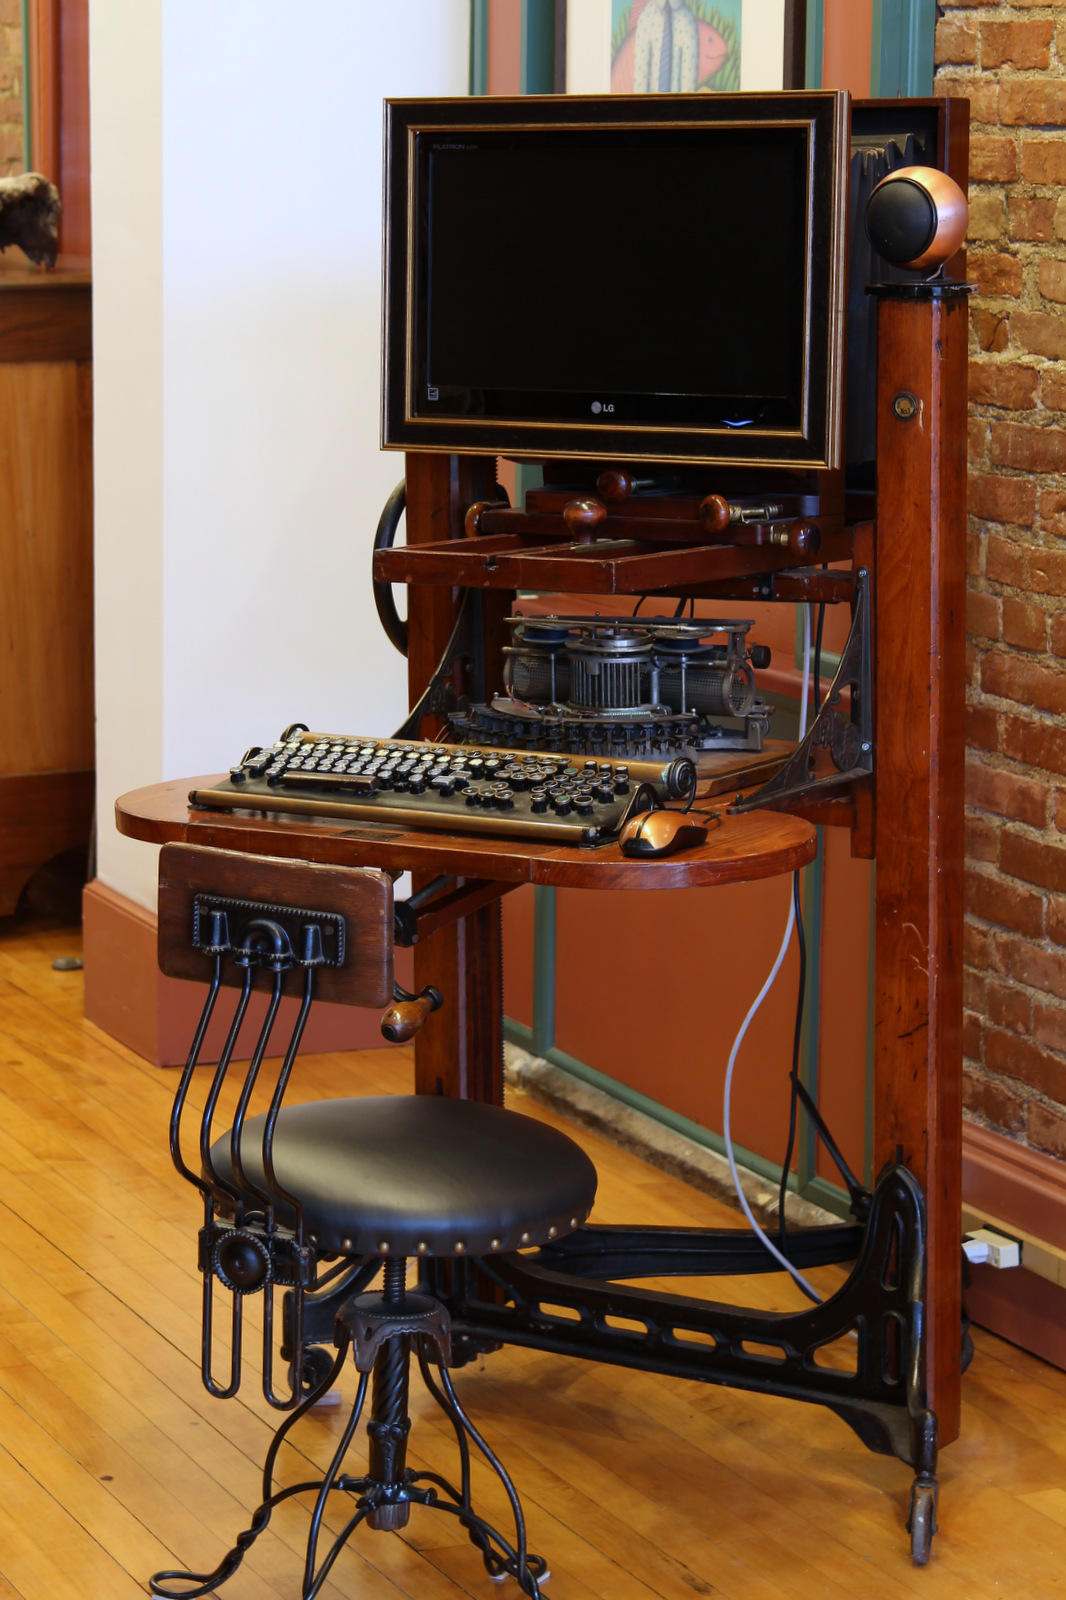 Camera Bellows Computer Workstation Modvic